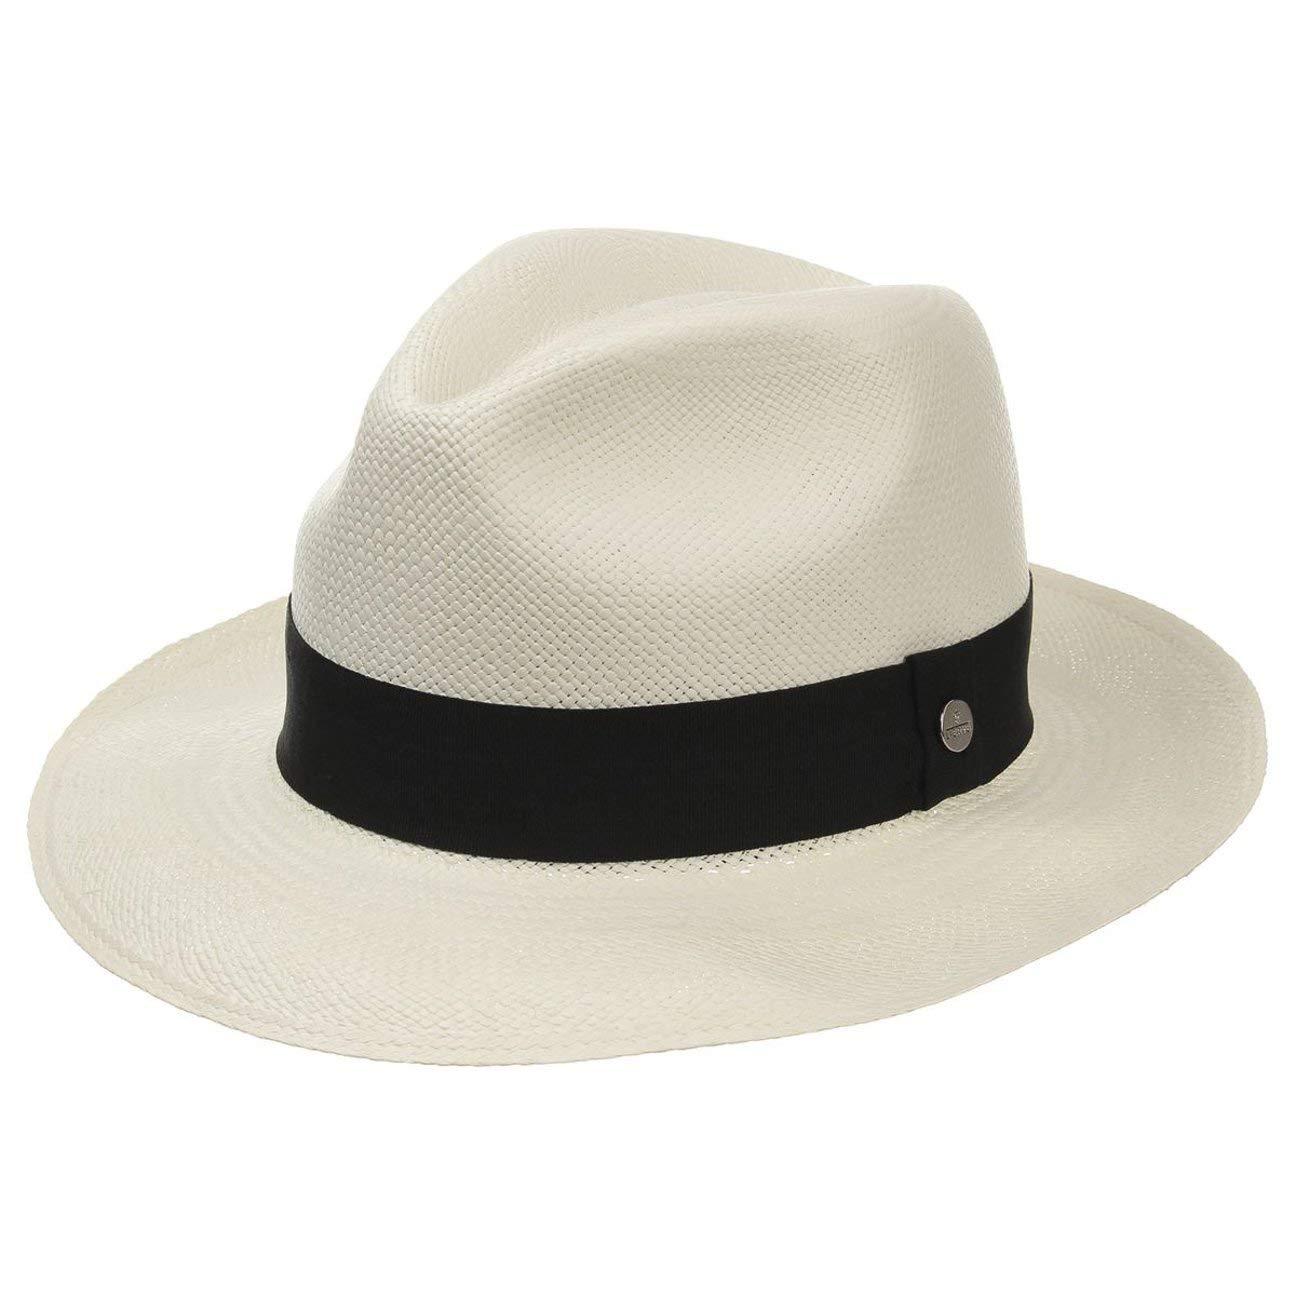 5cac05bd632 Lierys Classic Panama Hat by Women Men